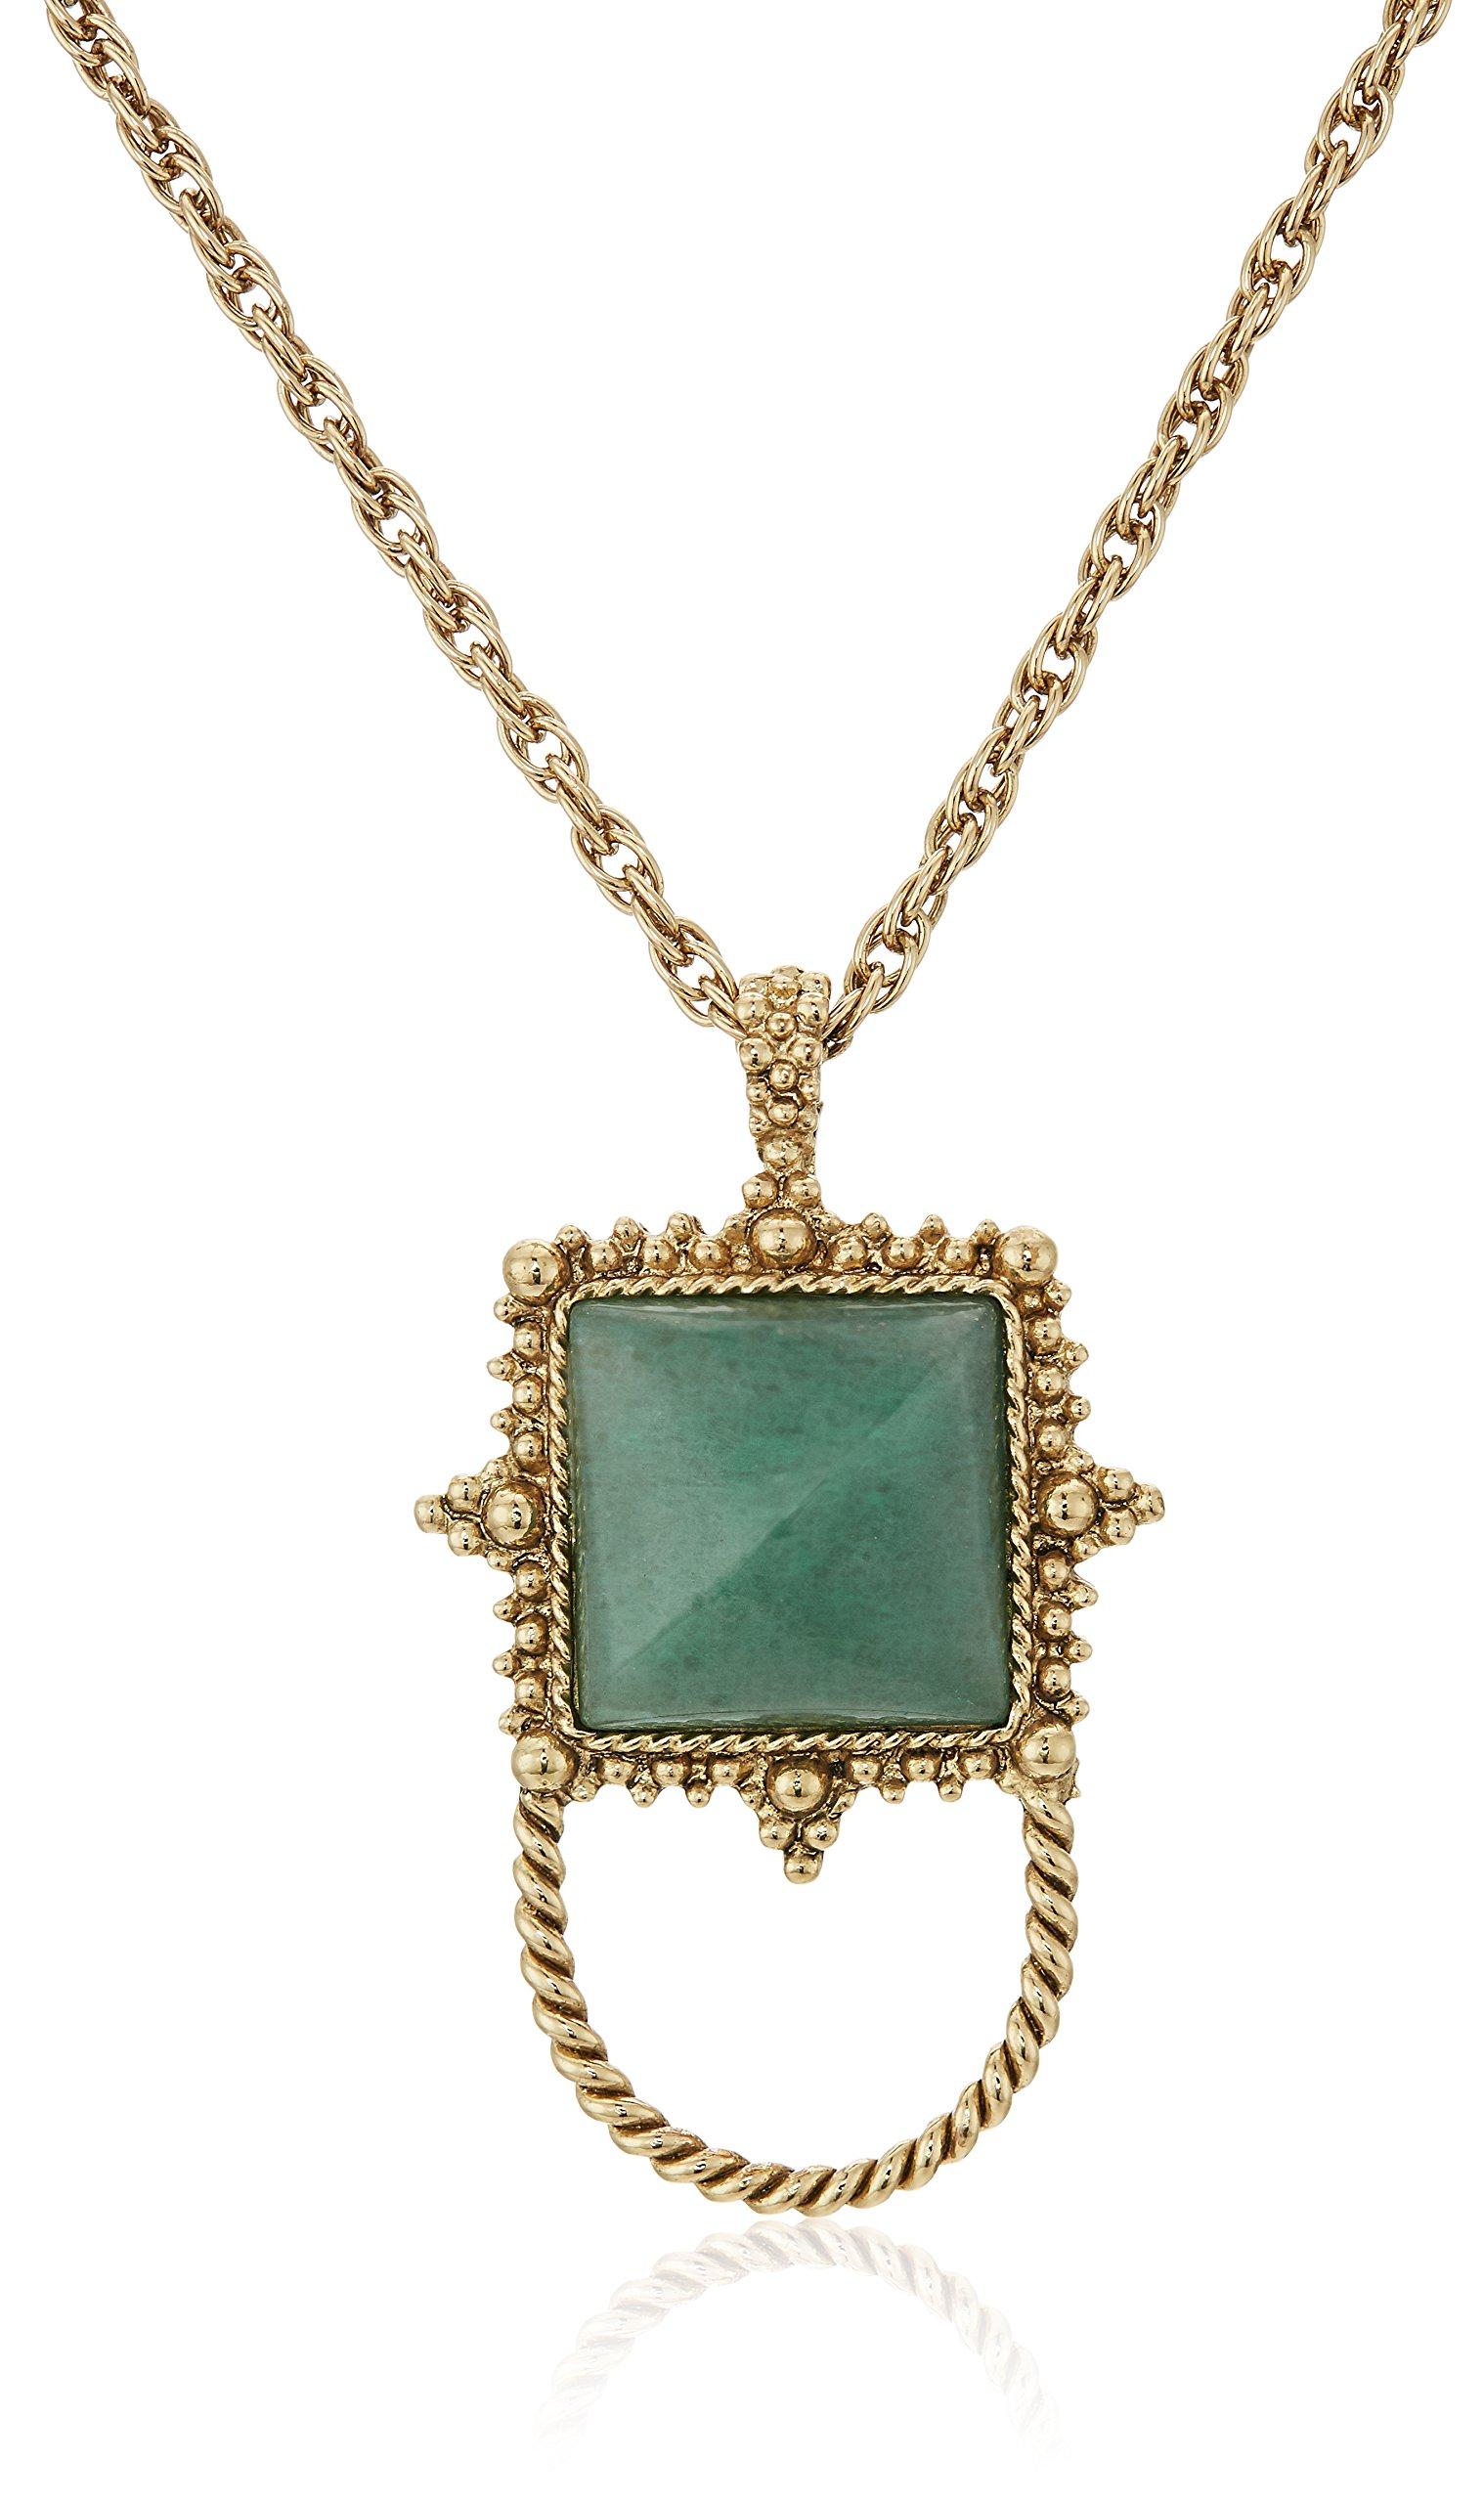 1928 Jewelry Womens Gold-Tone Semi-Precious Aventurine Square Eyeglass/Badge Holder Pendant Enhancer, green, 30